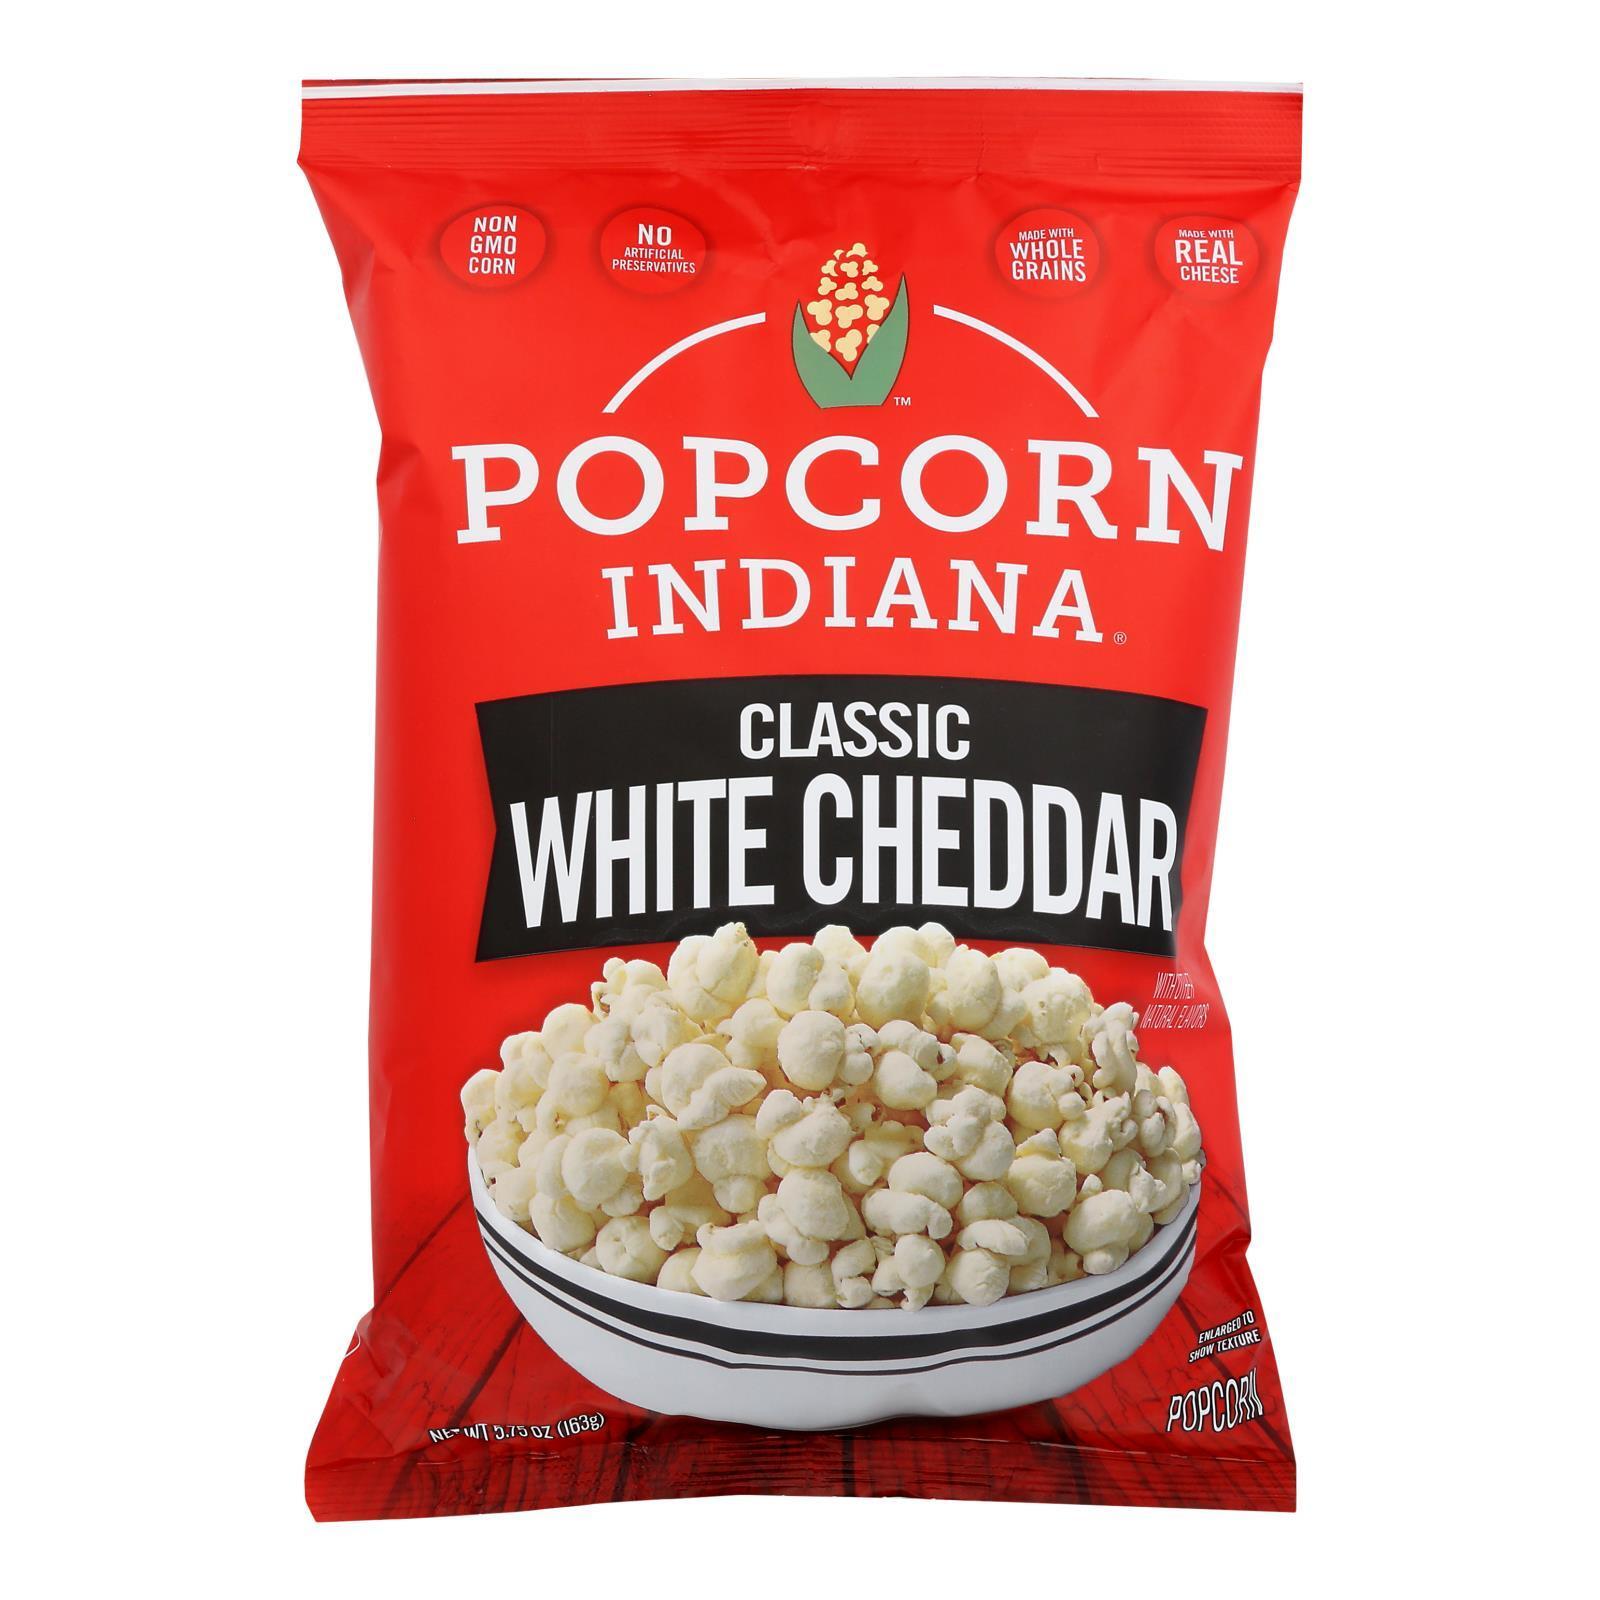 Popcorn Indiana Popcorn - Aged White Cheddar - Case of 12 - 5.75 oz.